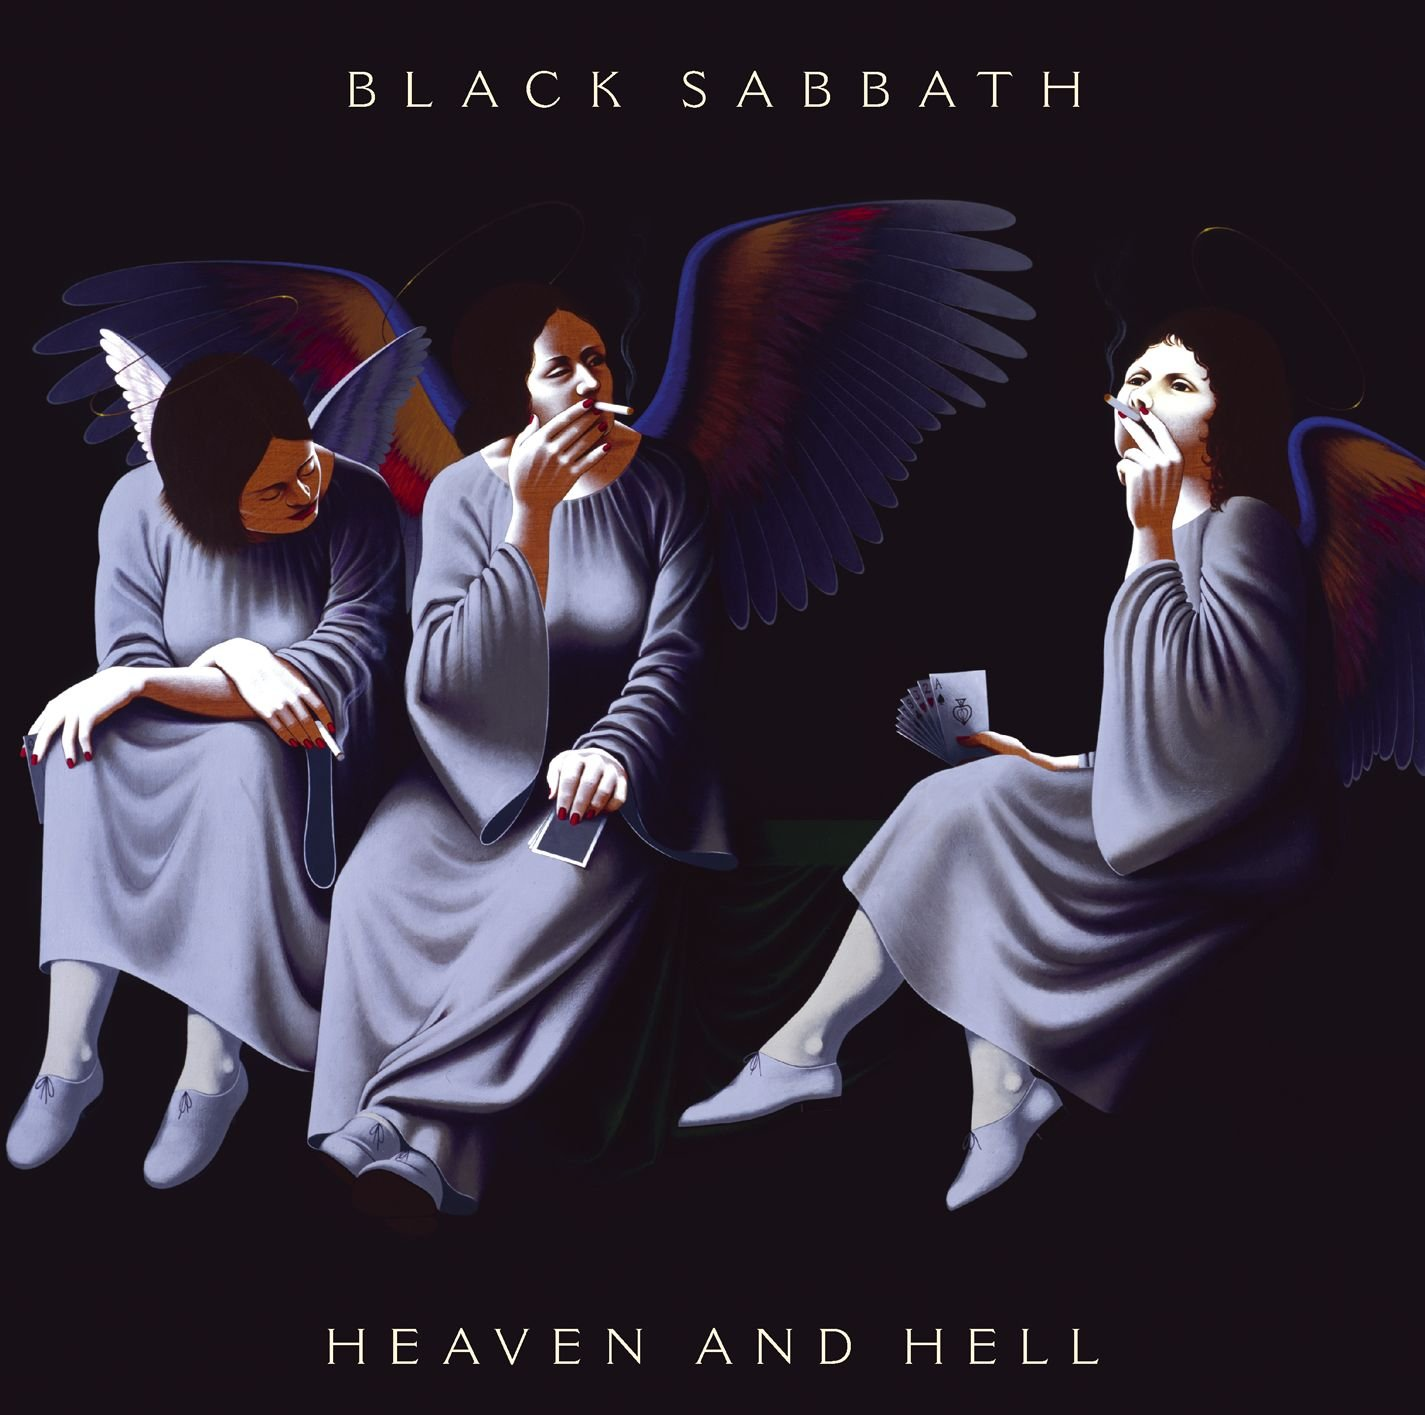 CD : Black Sabbath - Heaven and Hell (Remastered)